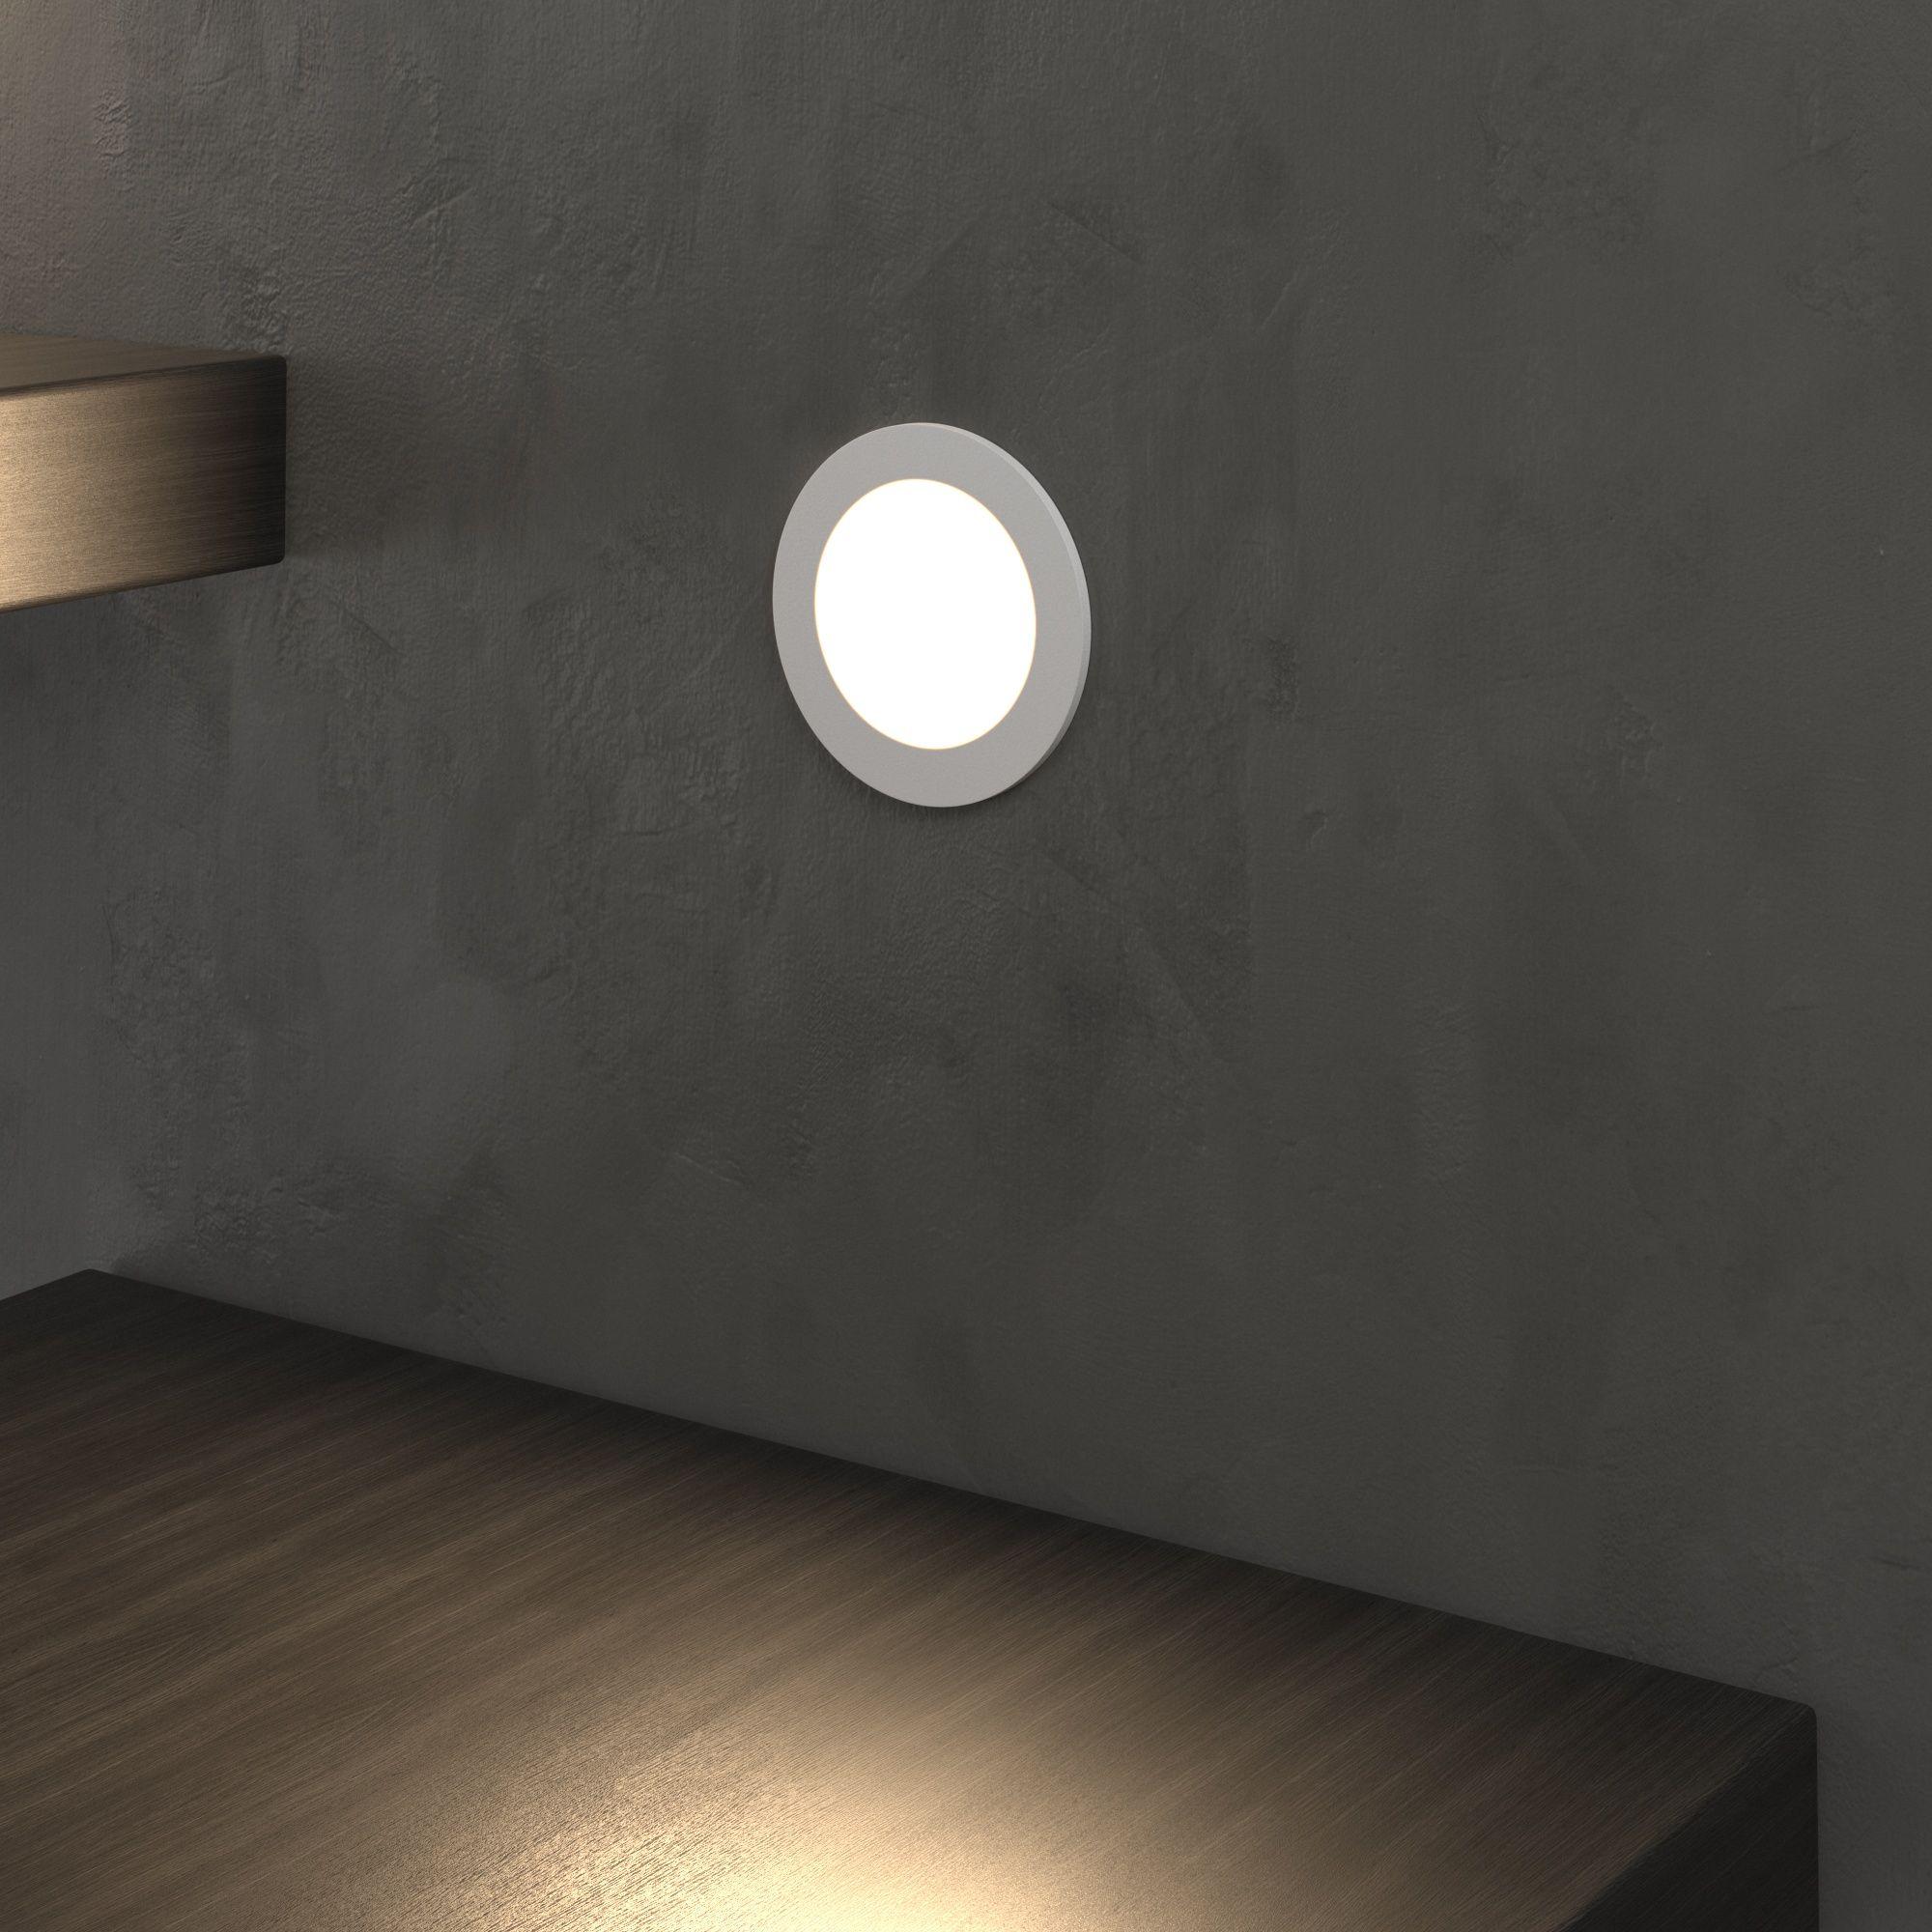 Подсветка для лестниц и дорожек MRL LED 1108 белый